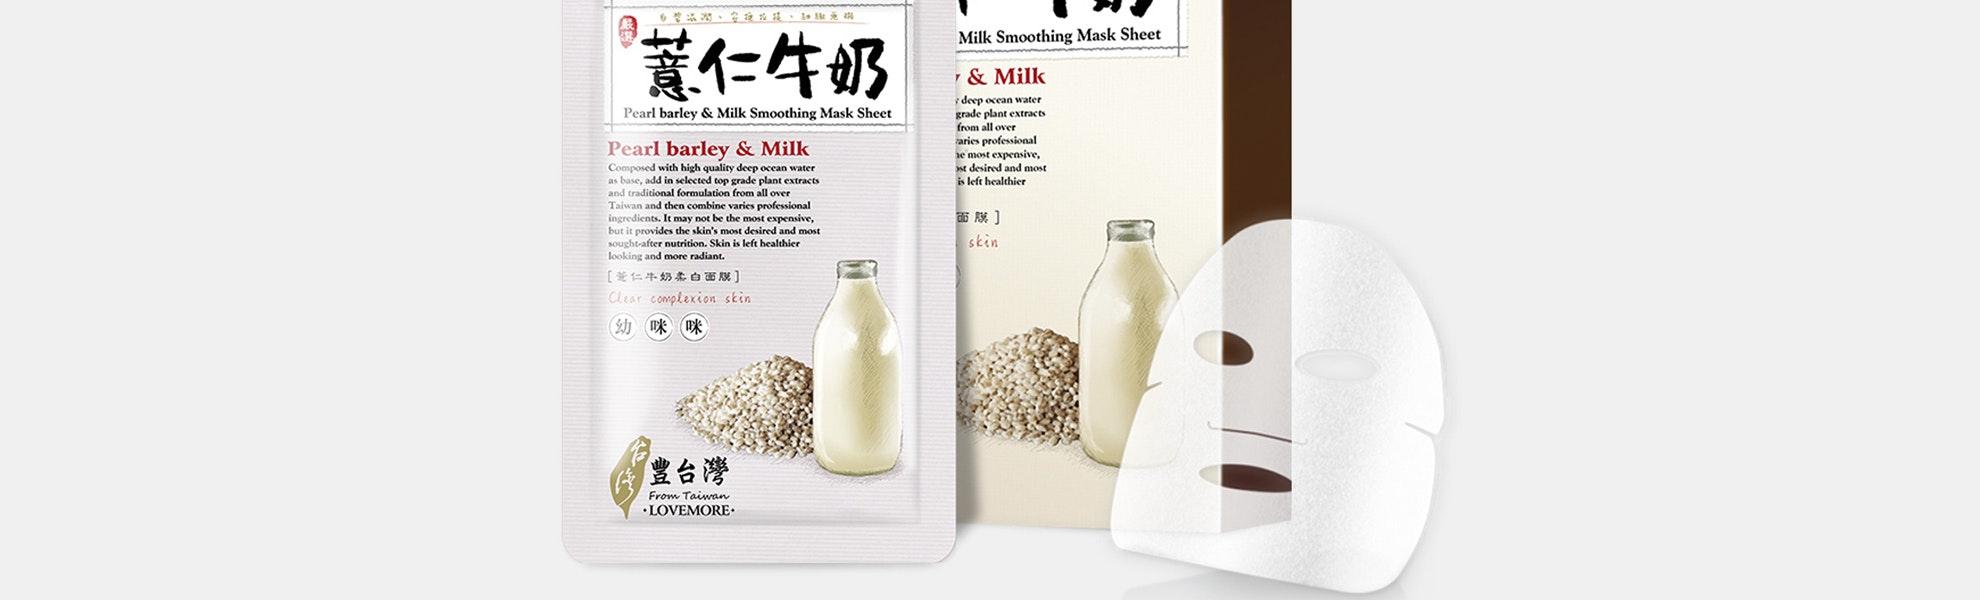 Lovemore Pearl Barley & Milk Smoothing Masks (5pcs)